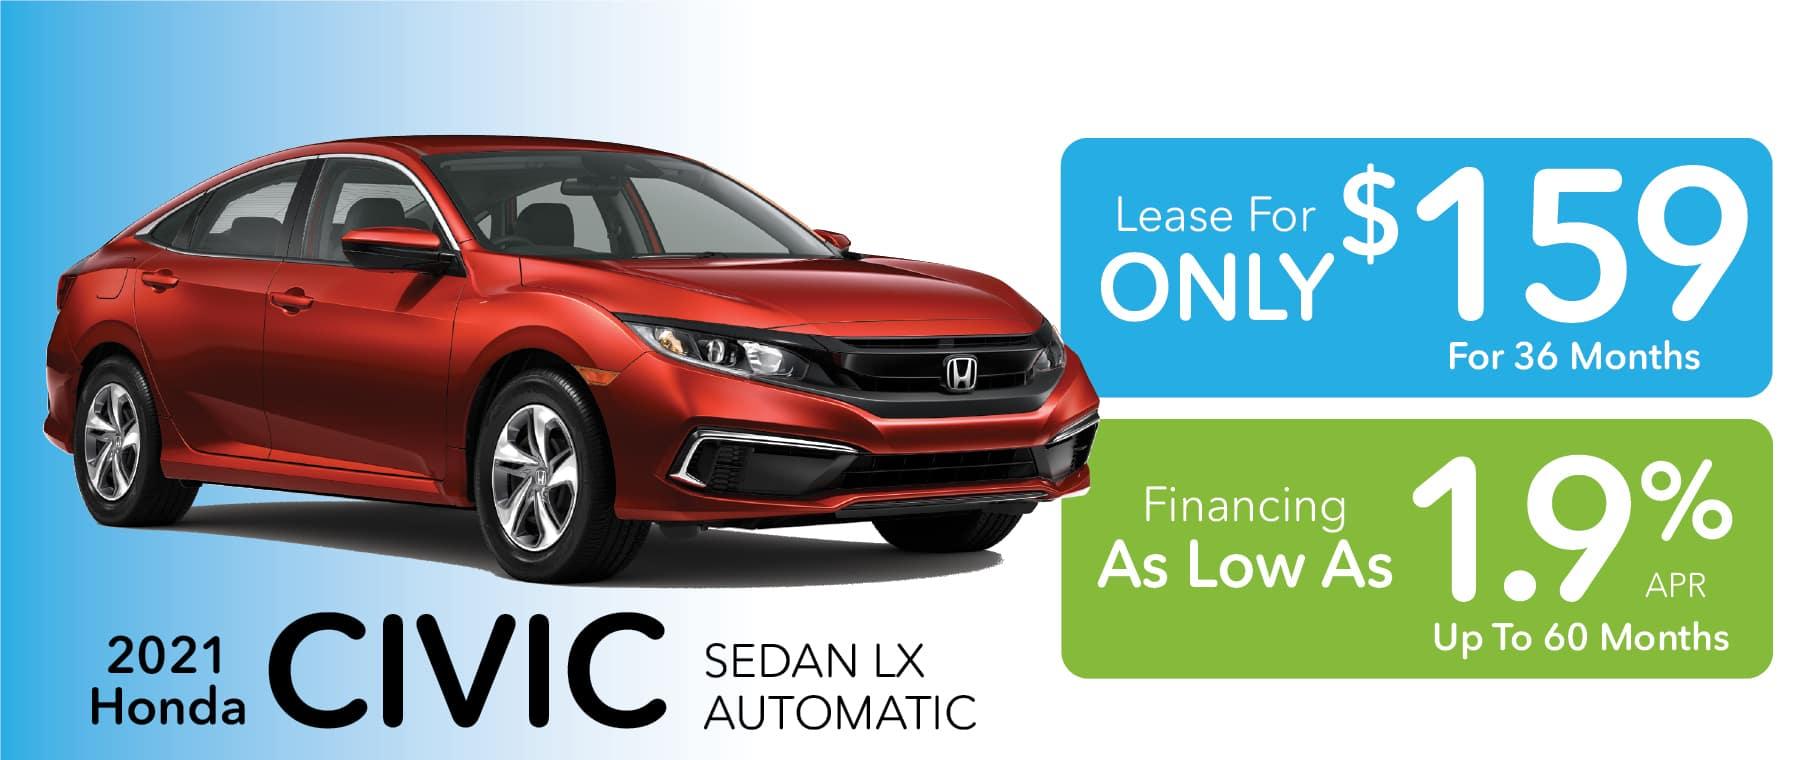 2020 Honda Civic LX Sedan lease or finance